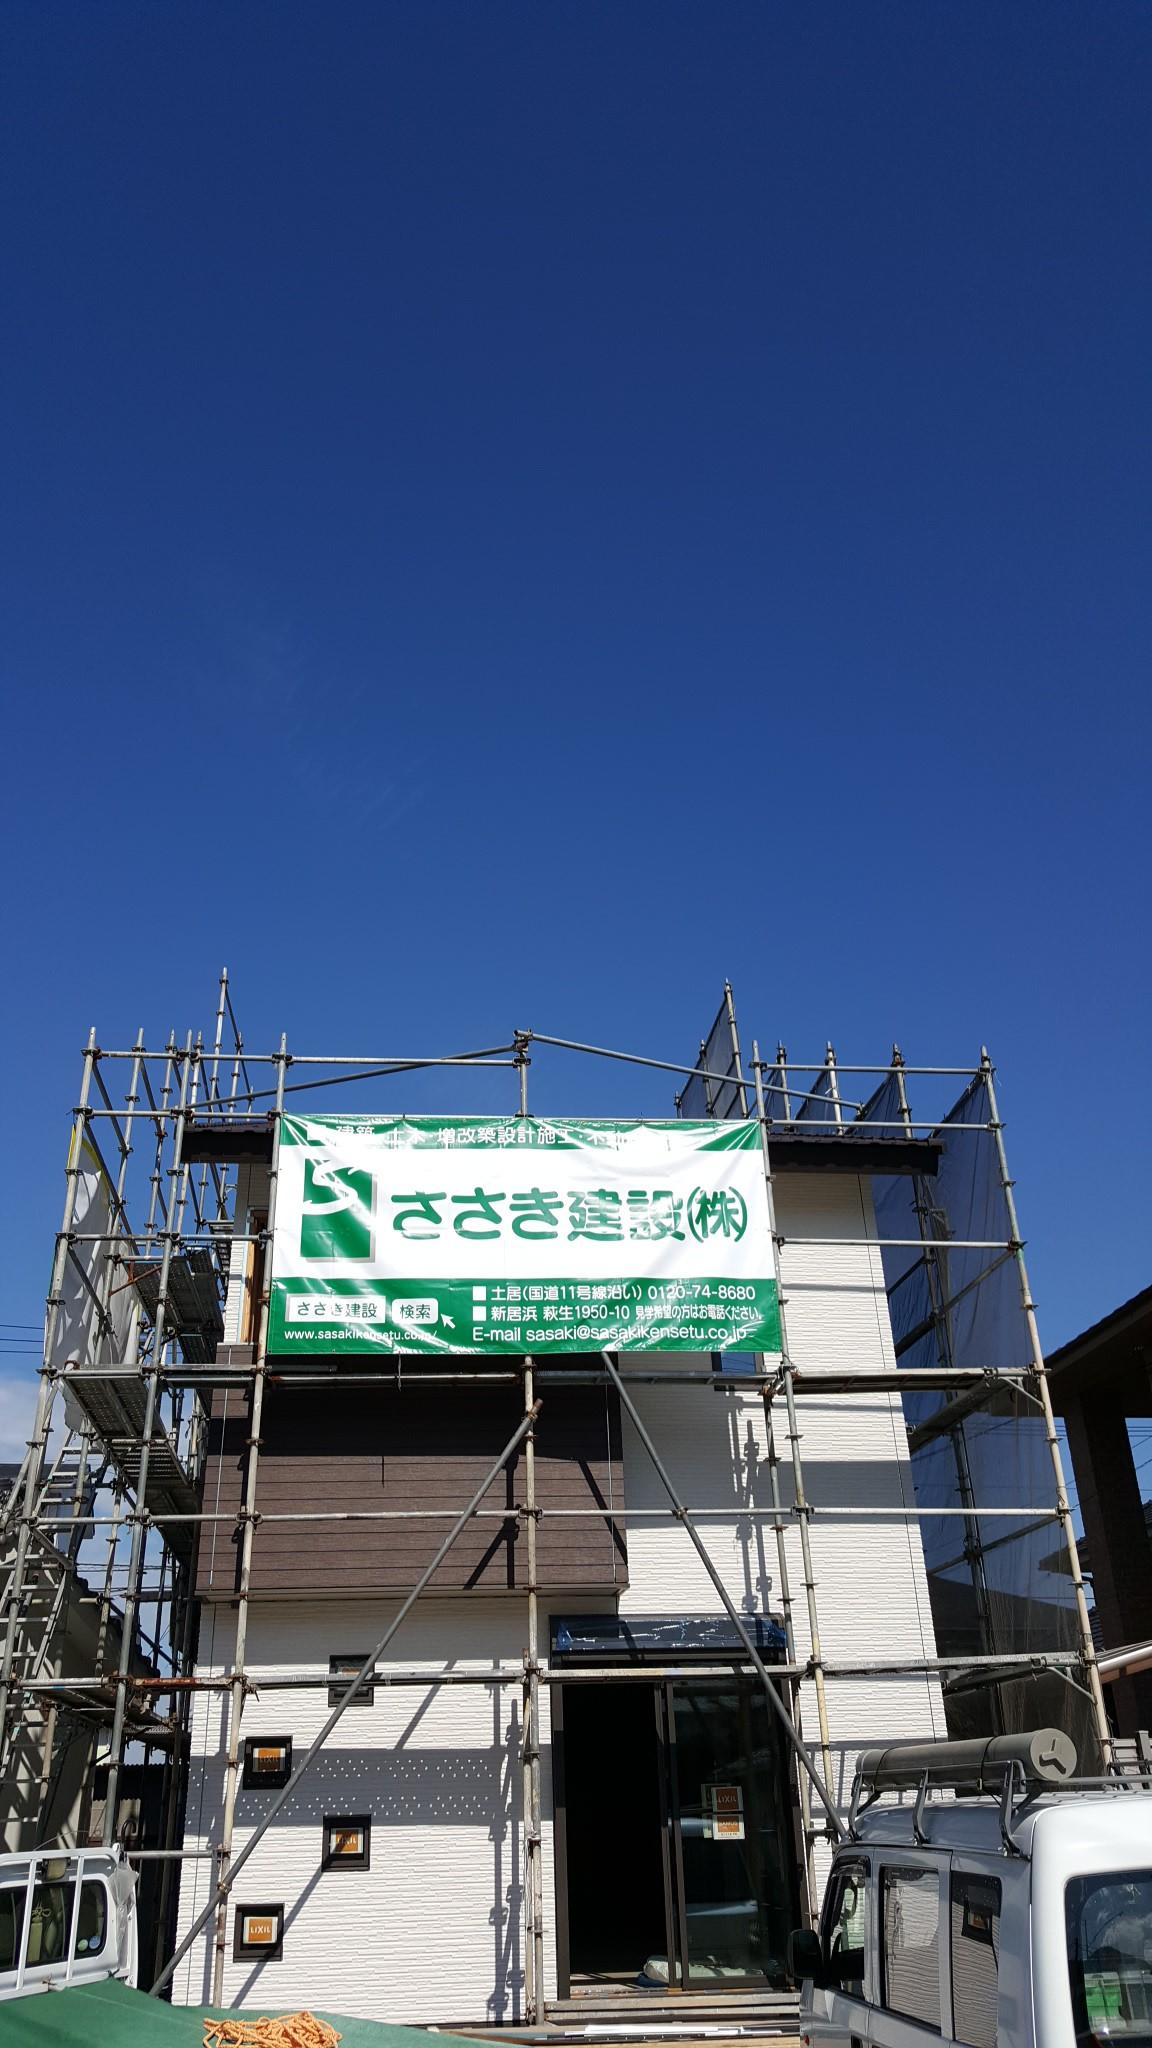 新居浜市で住宅新築の外観写真